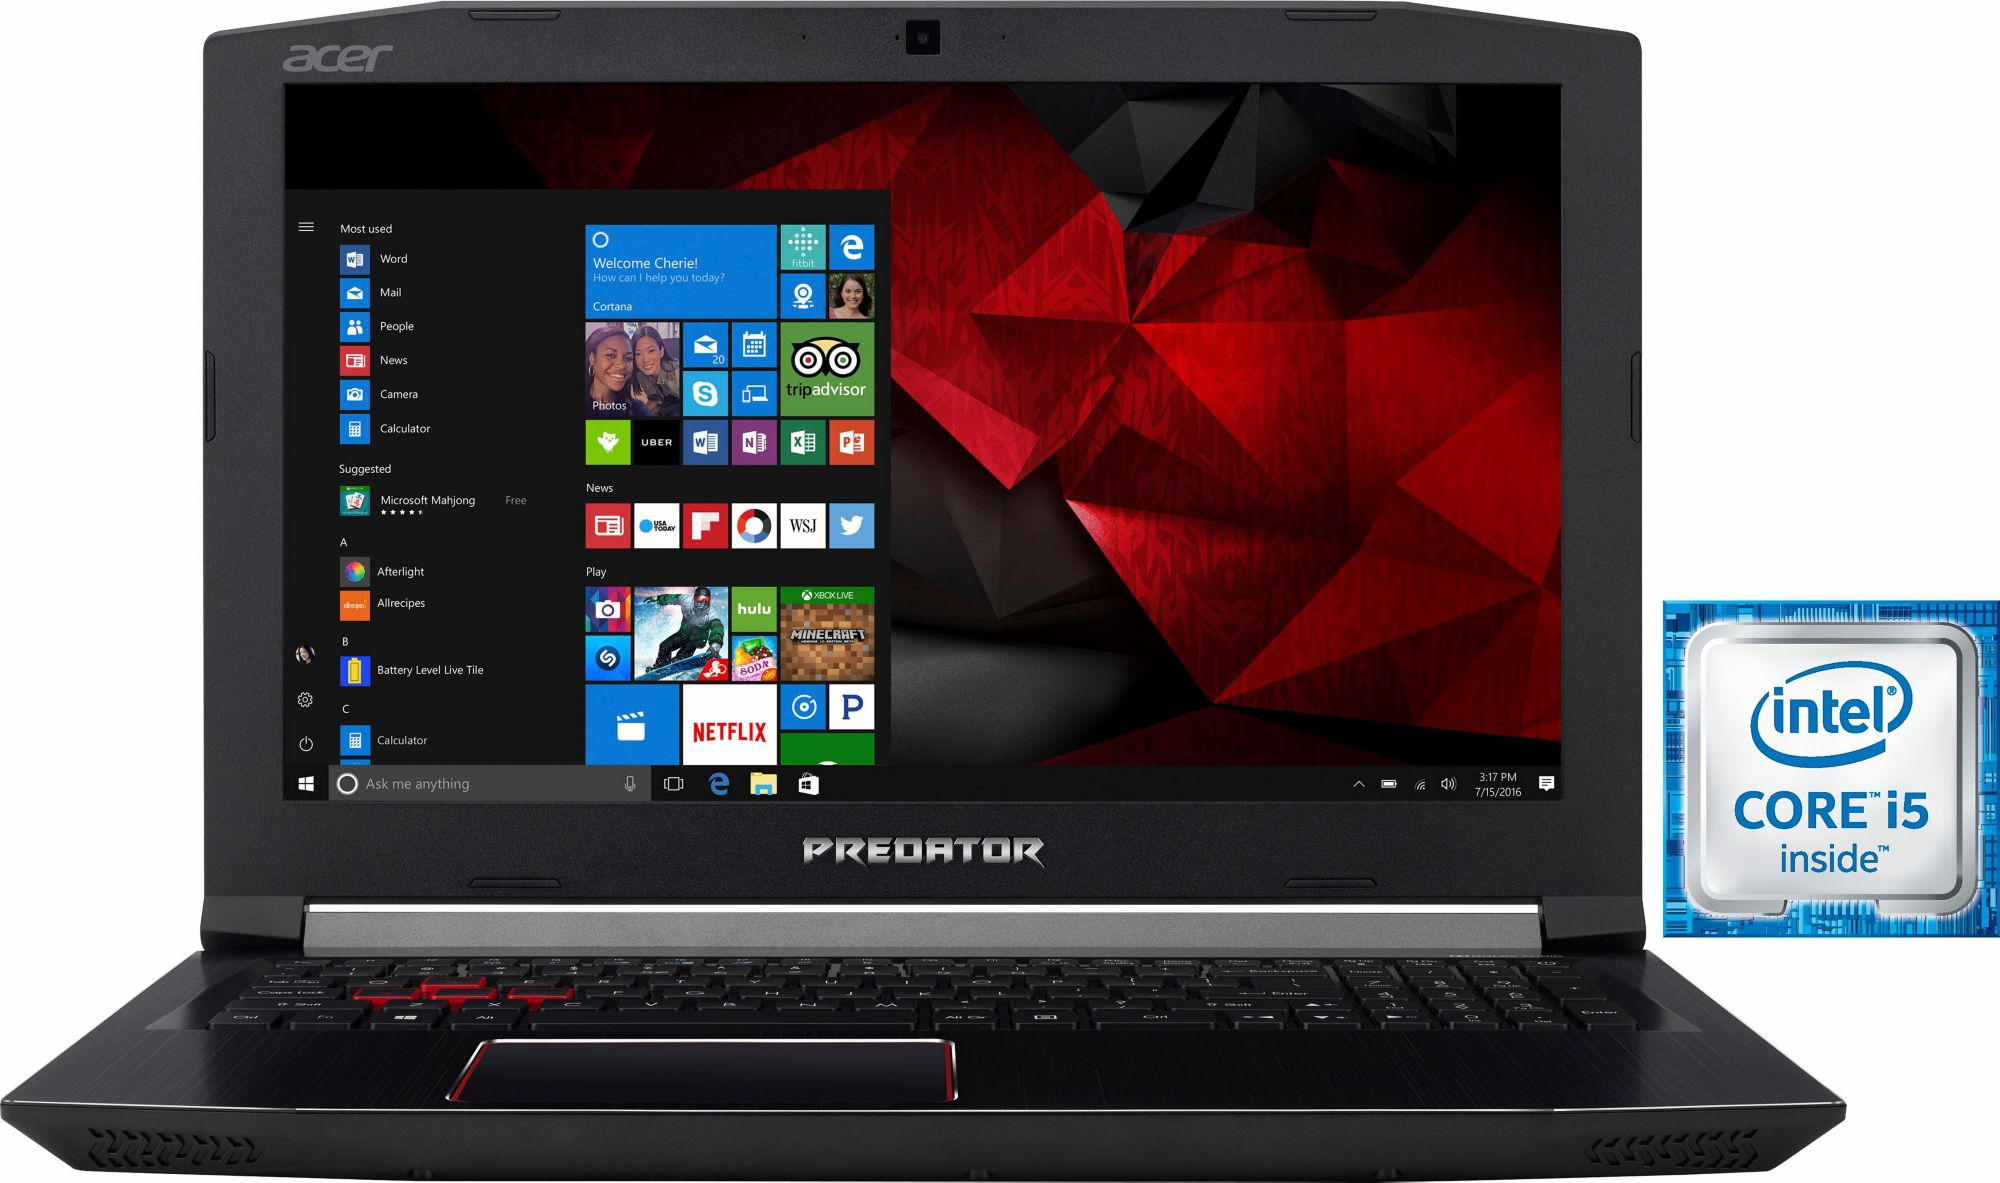 ACER Acer Predator PH317-51-56LW Notebook, Intel® Core? i5, 43,9 cm (17,3 Zoll), 1256 GB Speicher